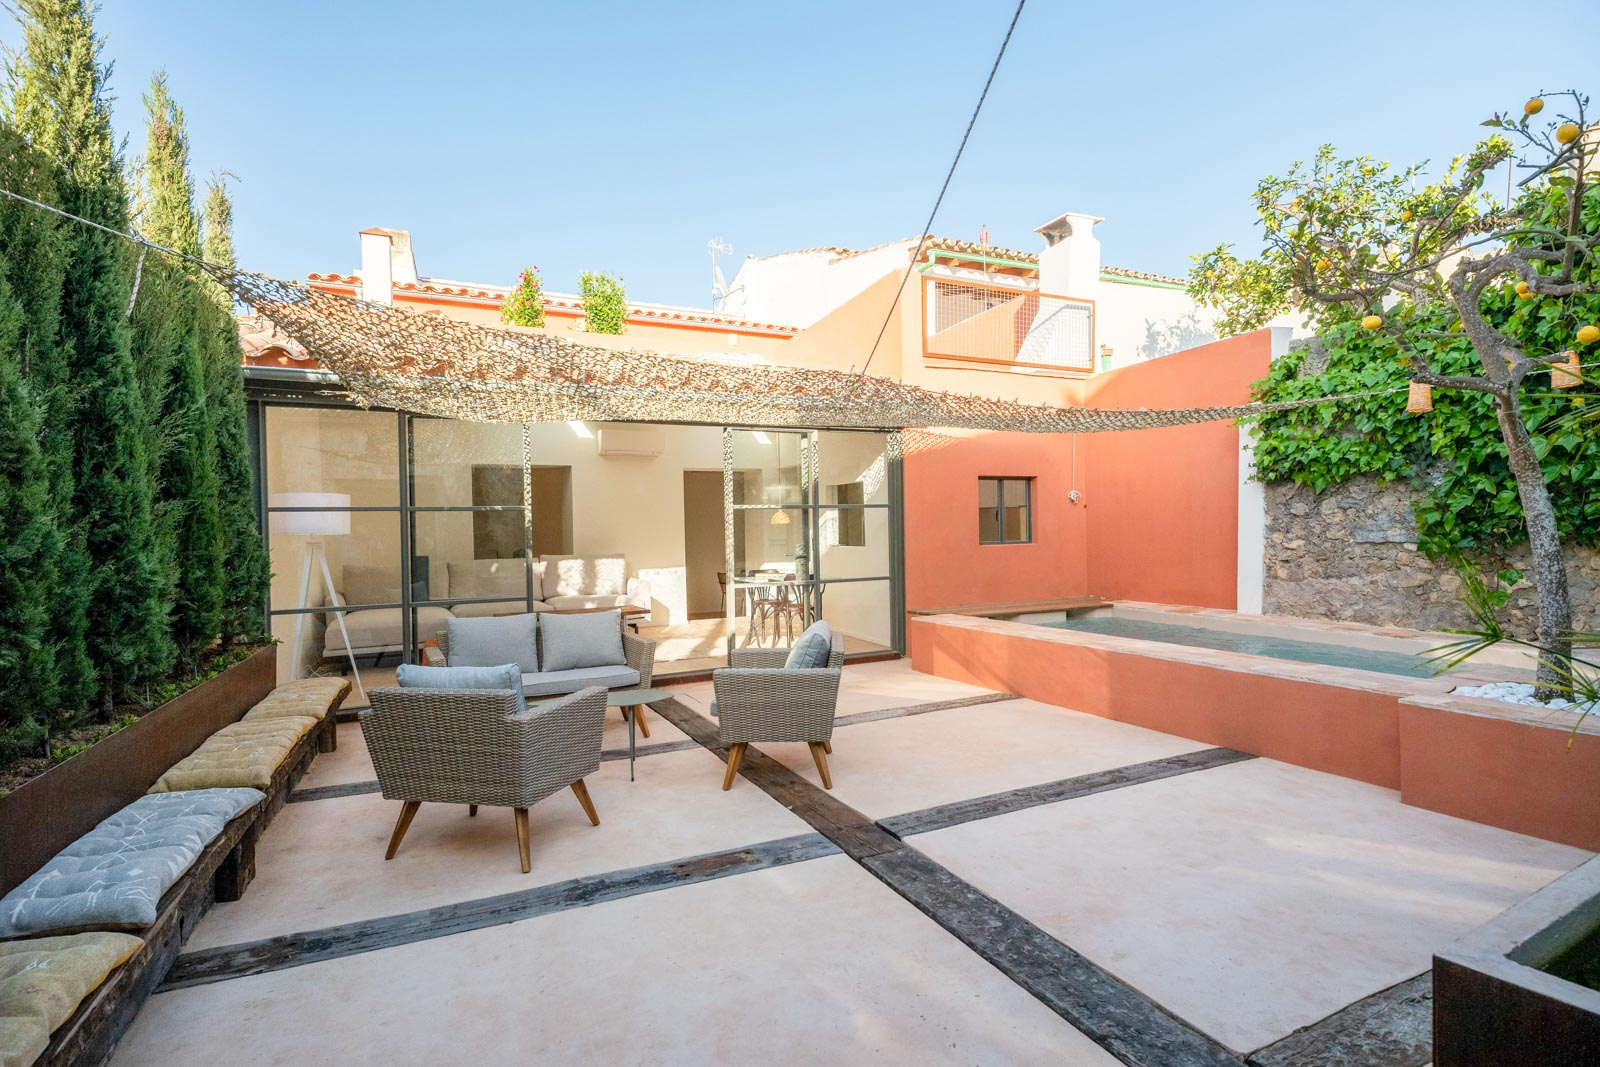 Luxuriöses traditionelles mallorquinisches Stadthaus mit Pool